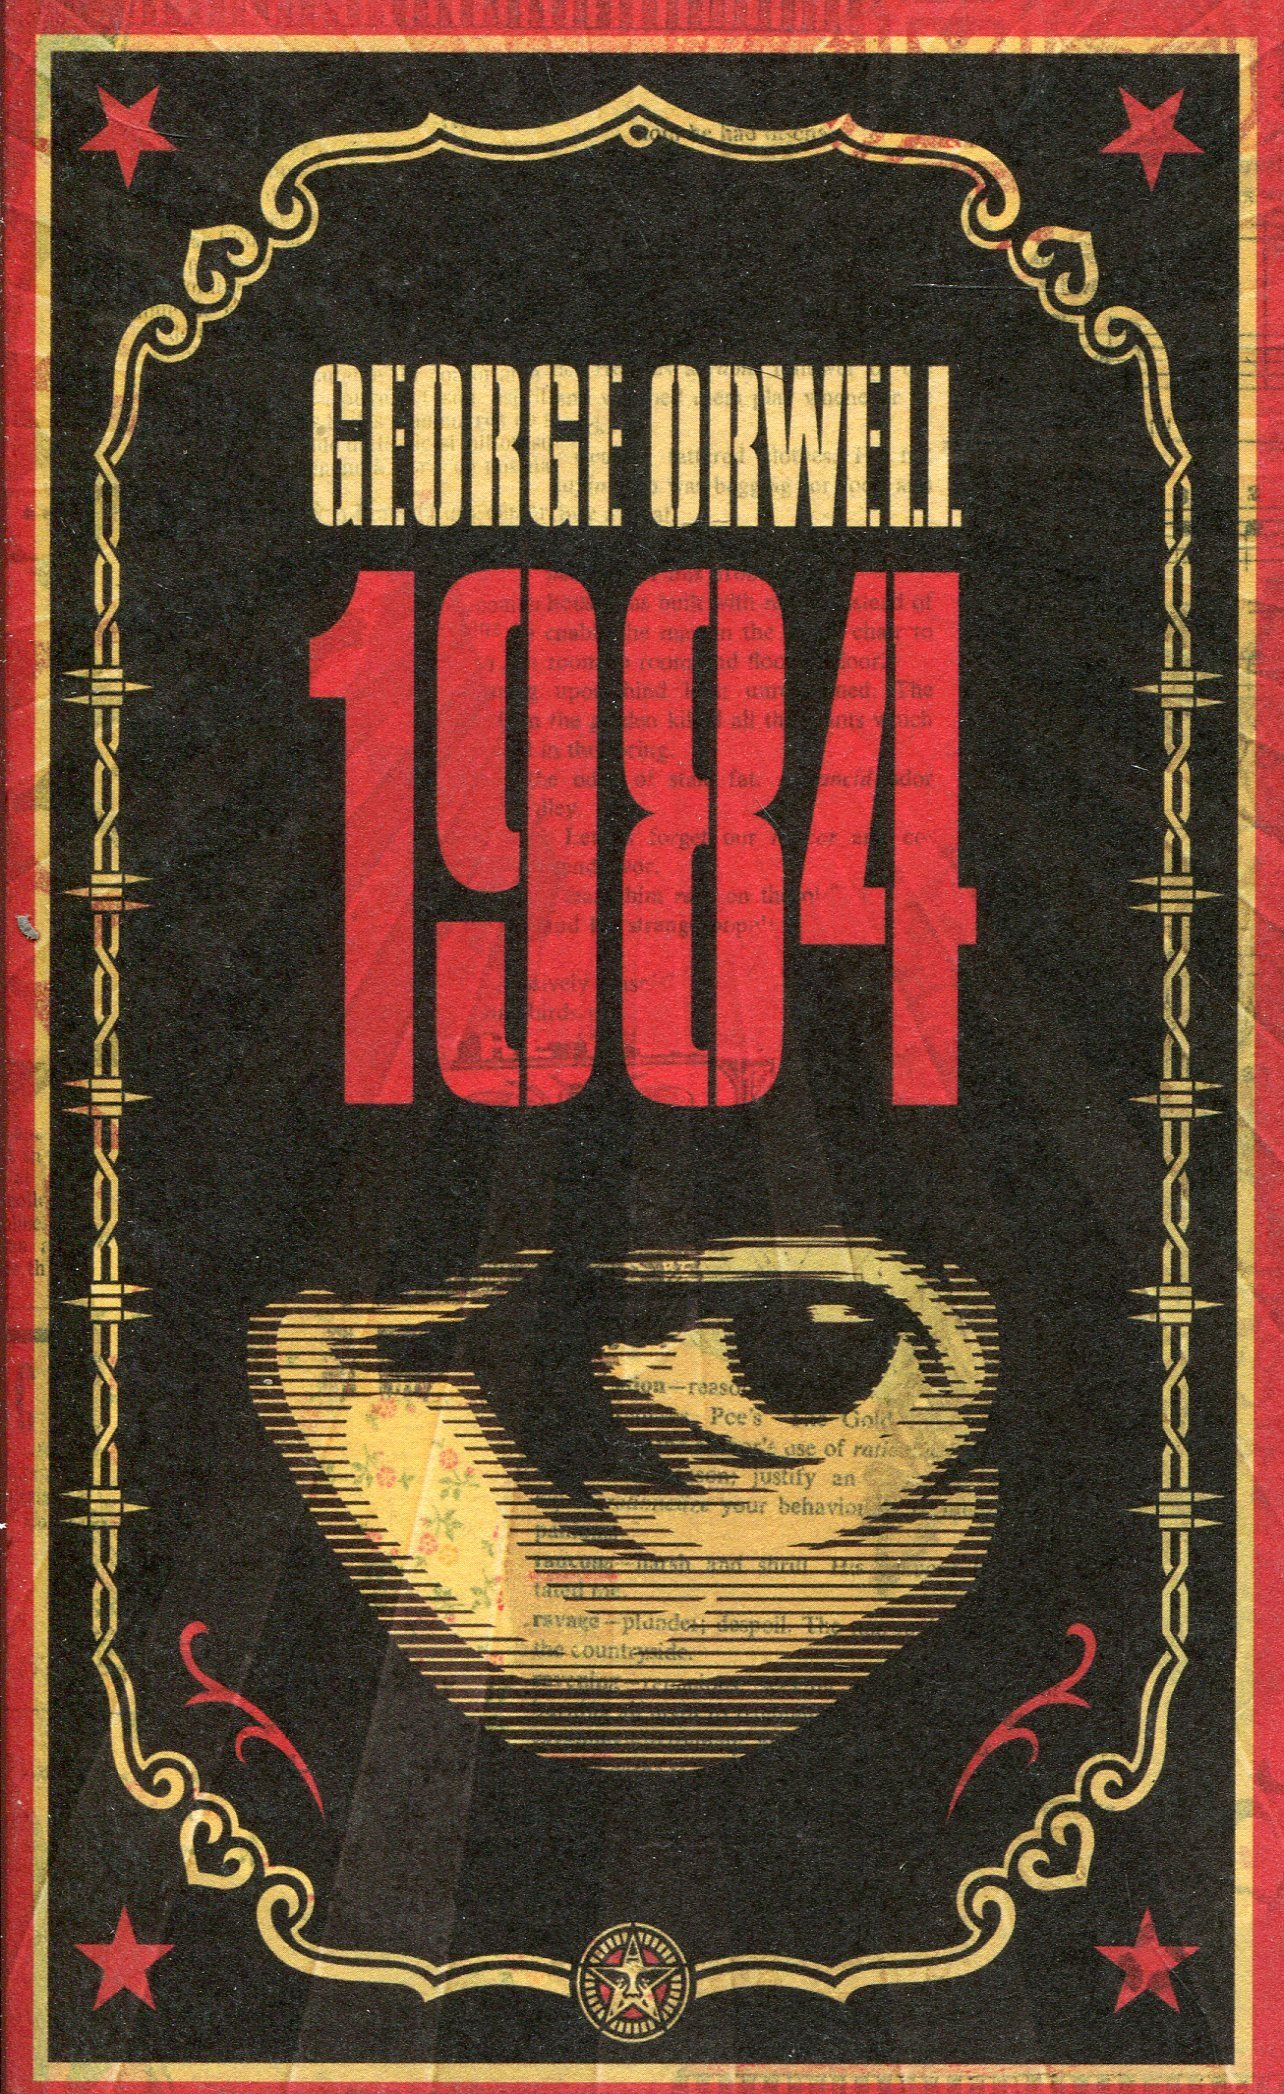 The novel 1984 Case Study